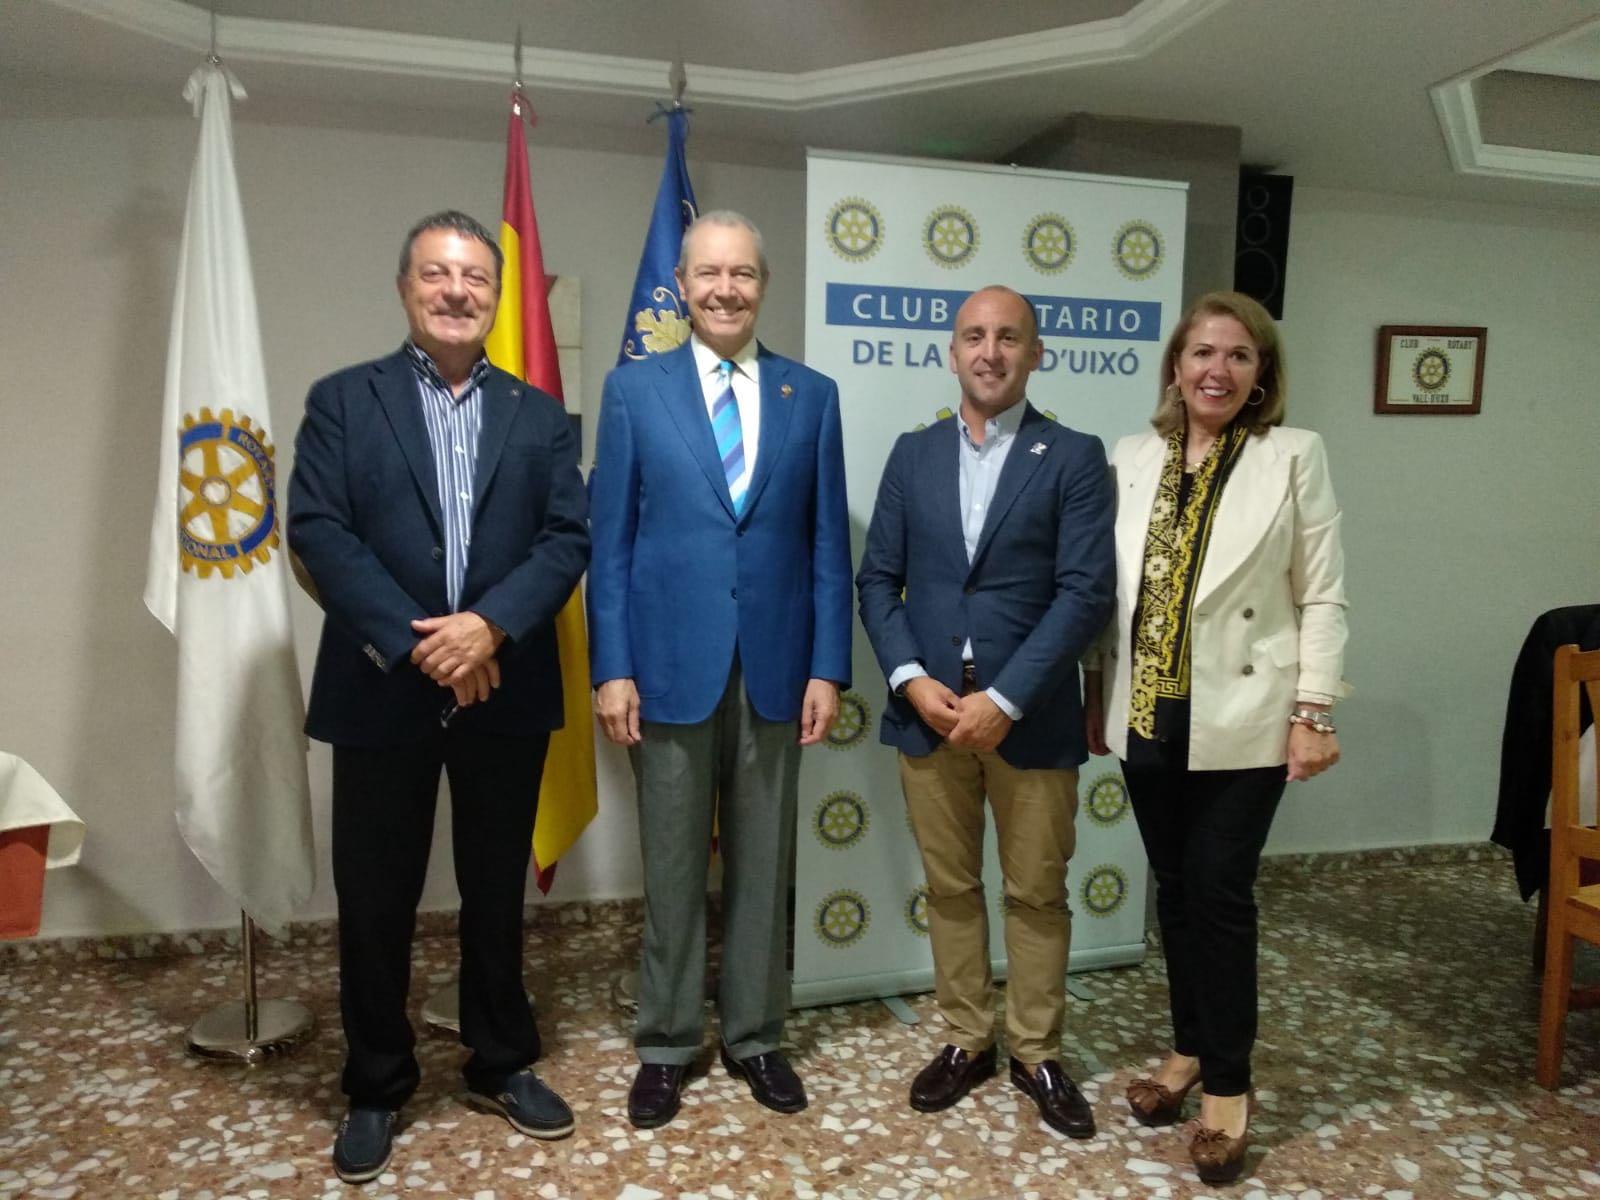 Rotary Club Vall de Uxo